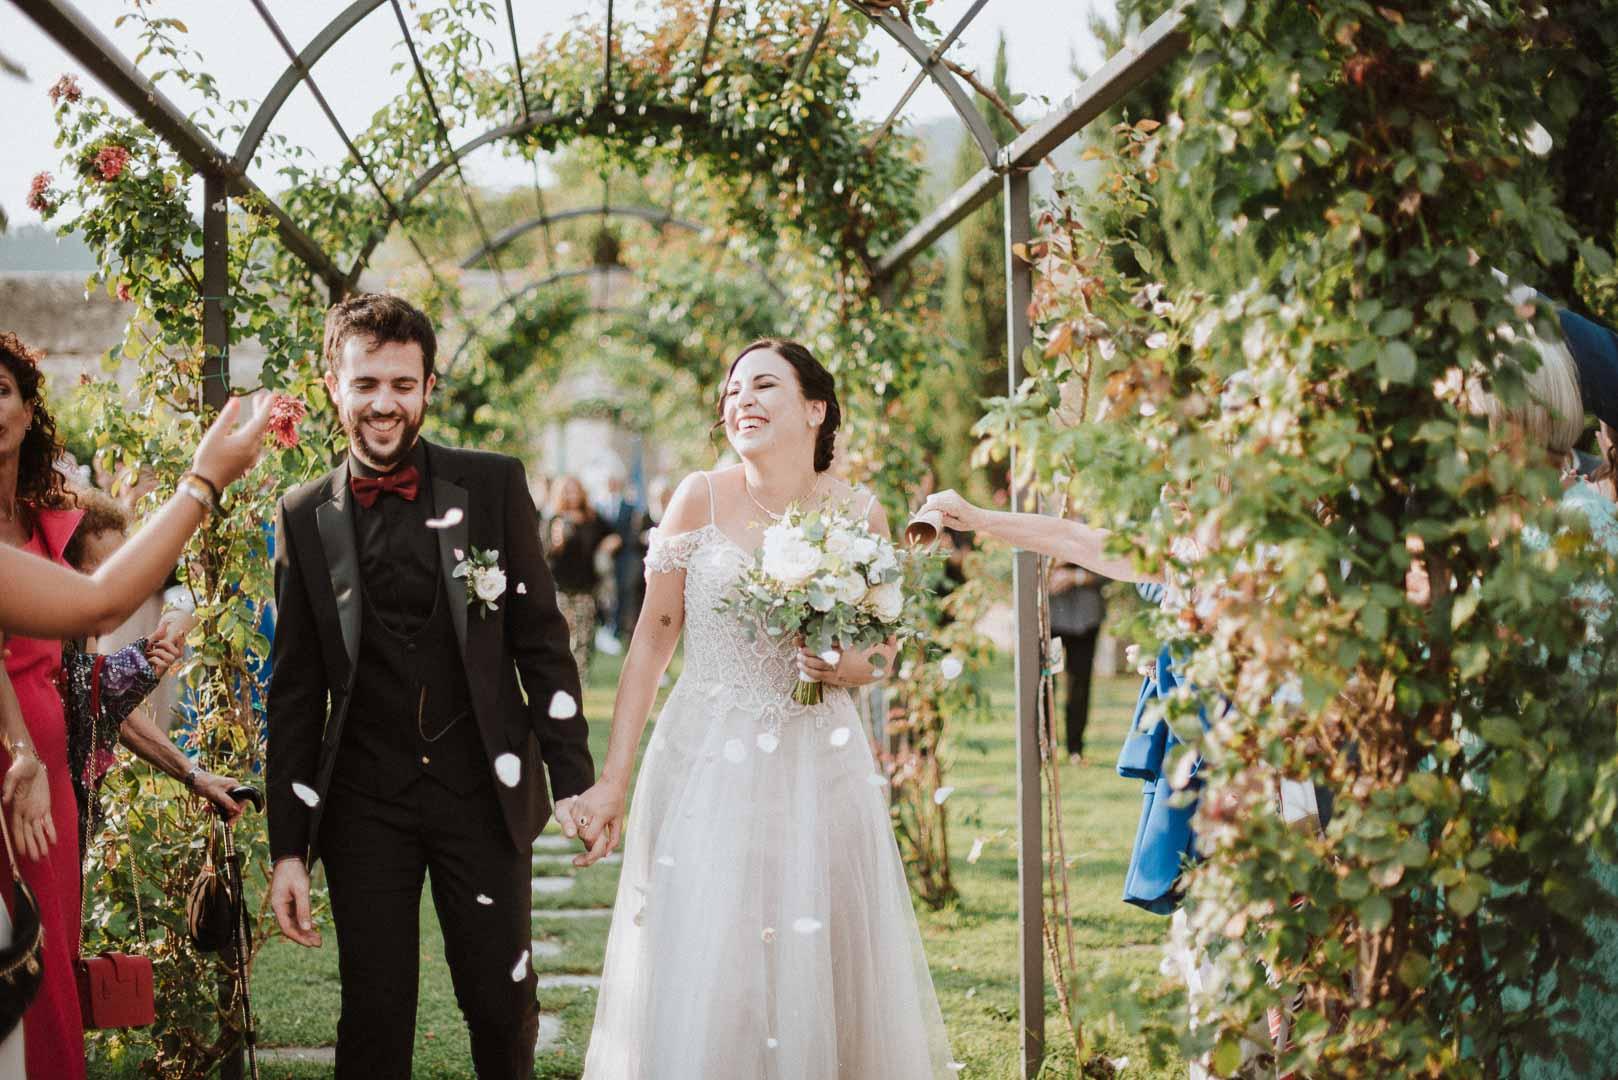 wedding-photographer-destination-fineart-bespoke-reportage-tuscany-villascorzi-vivianeizzo-spazio46-85